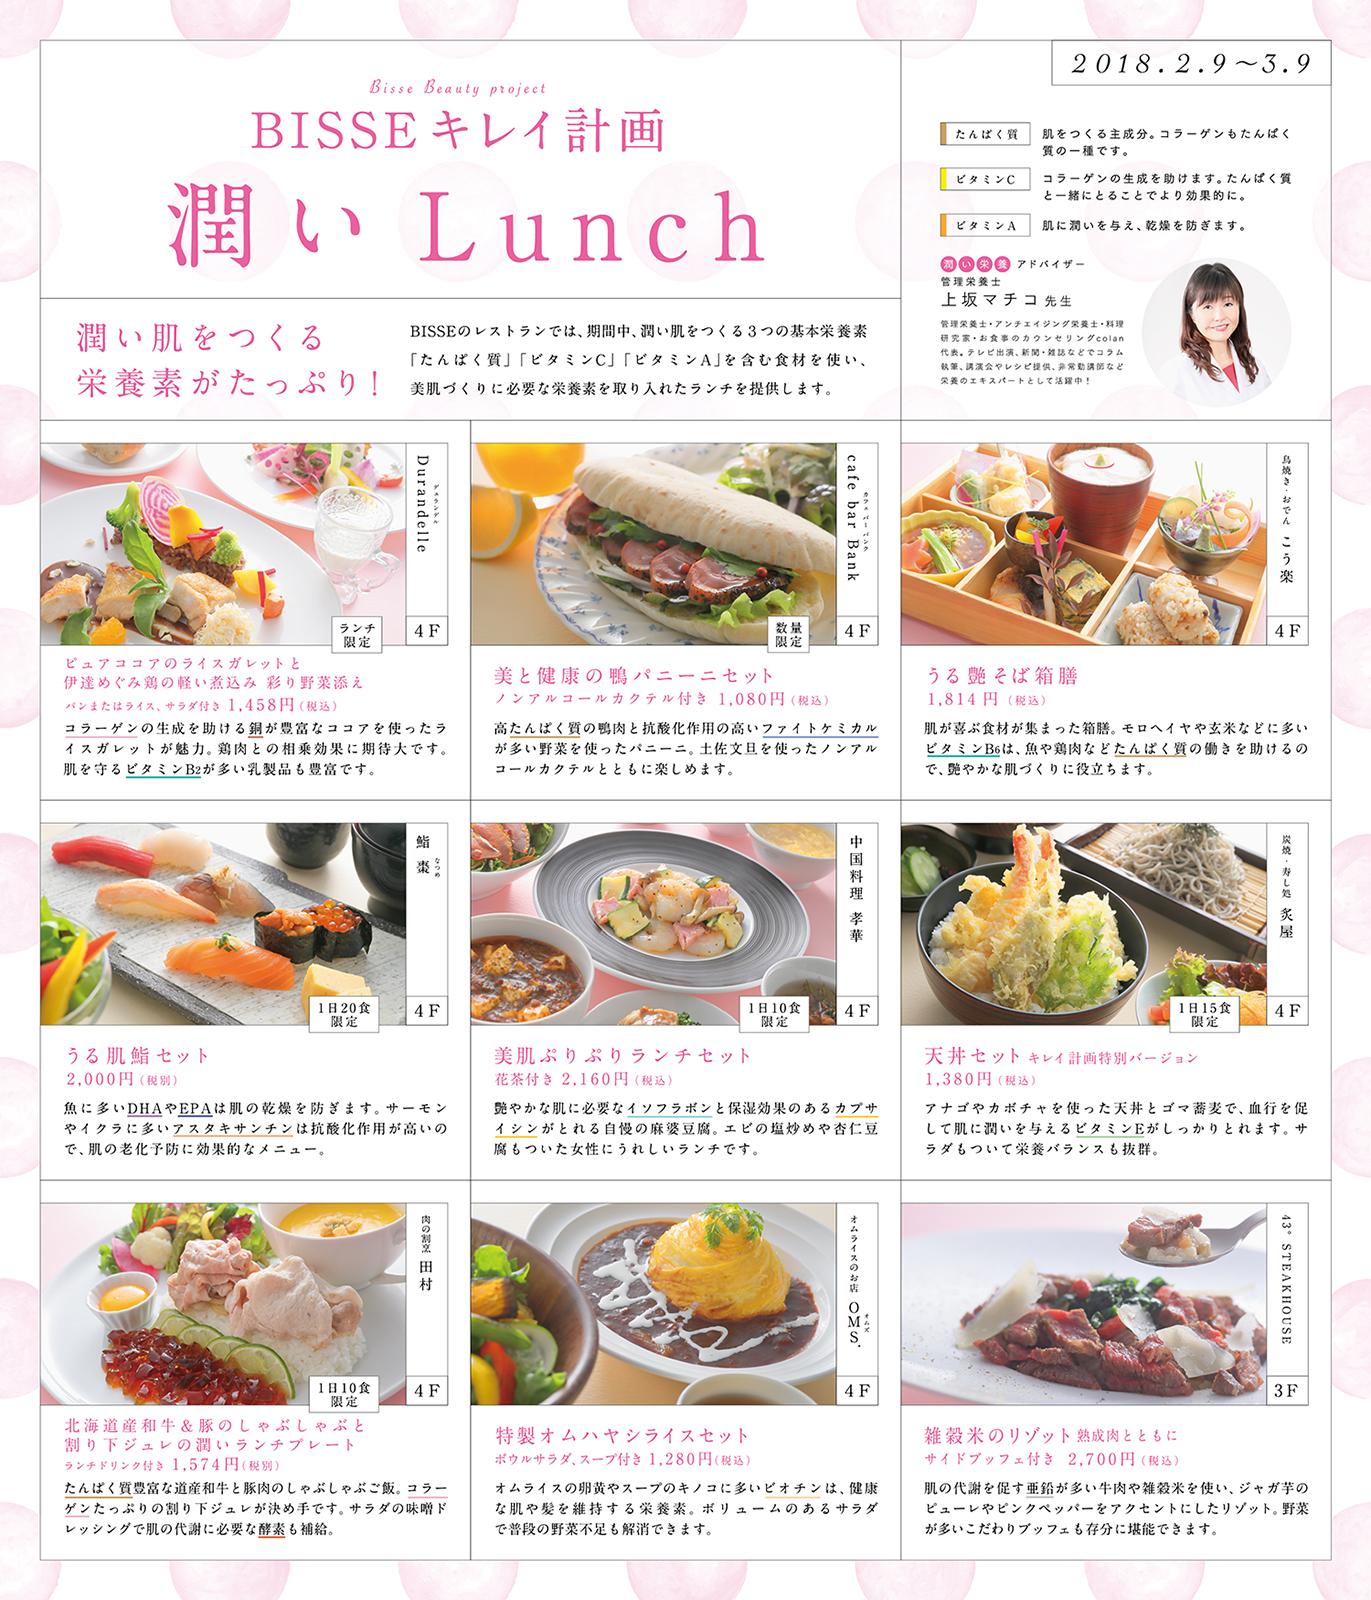 http://www.odori-bisse.com/info/up_images/news_180205_img01.jpg